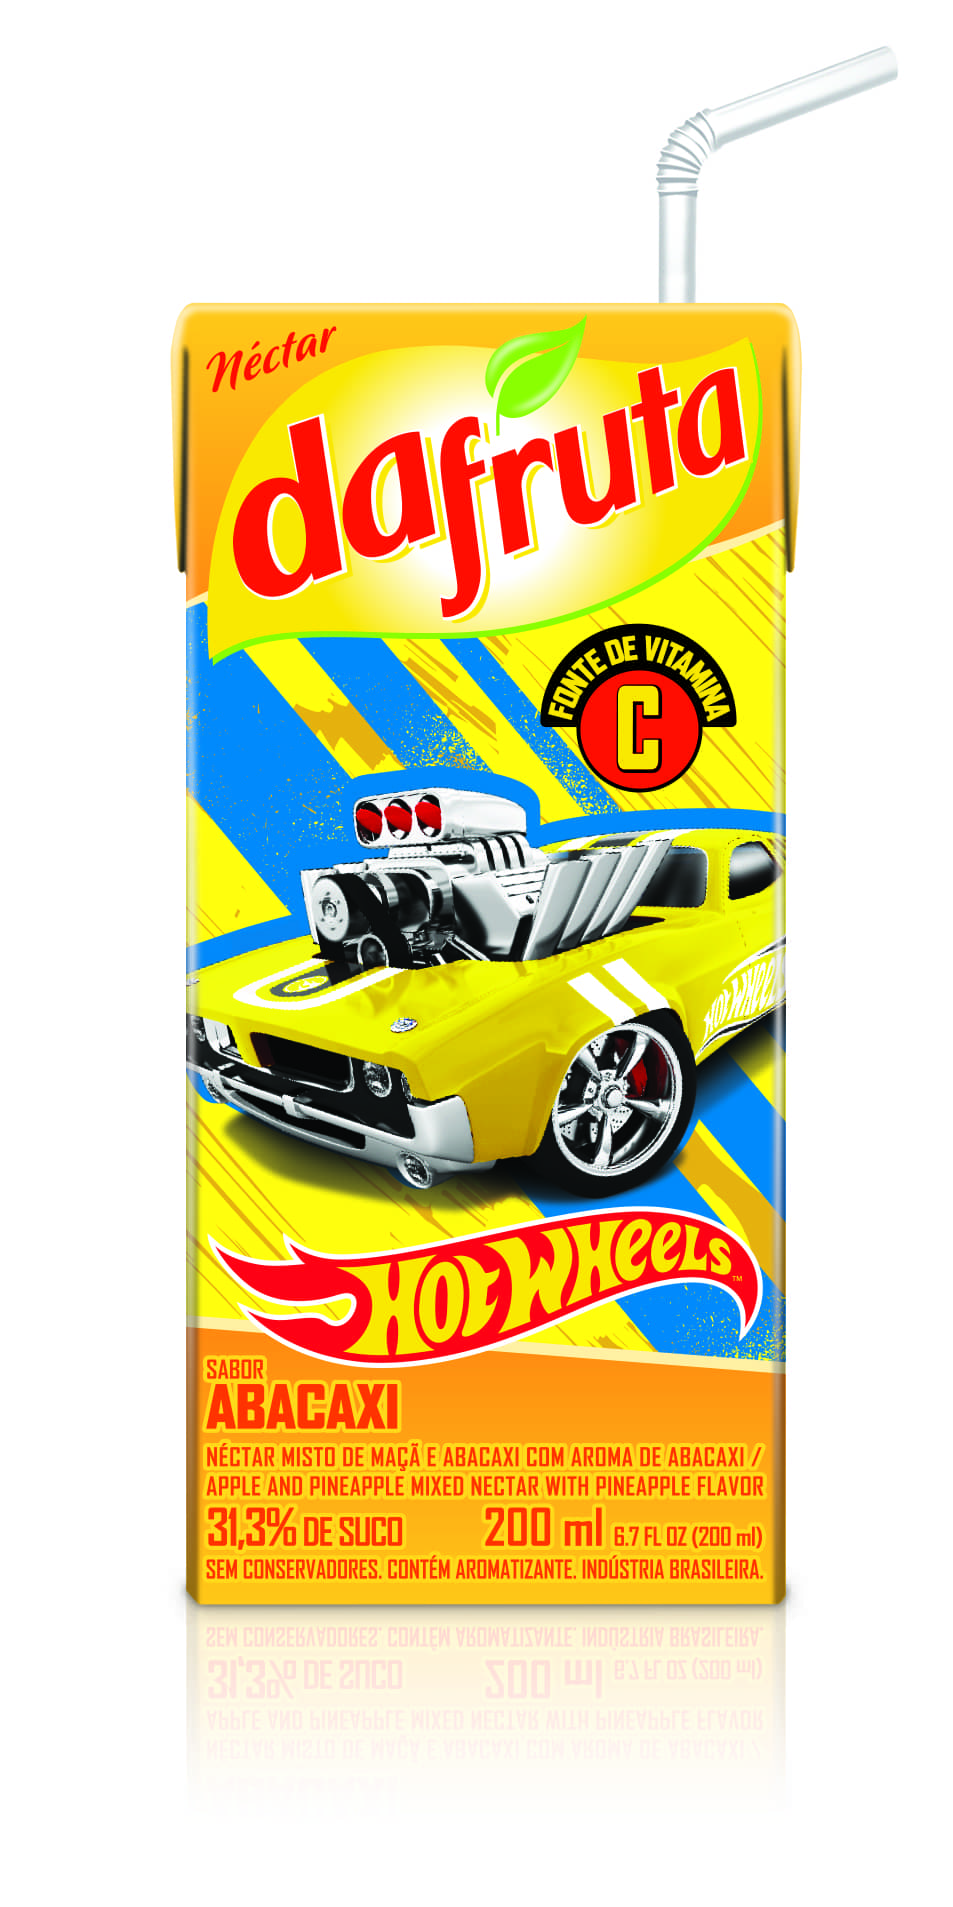 Dafruta-HotWheels-Abacaxi-200ml